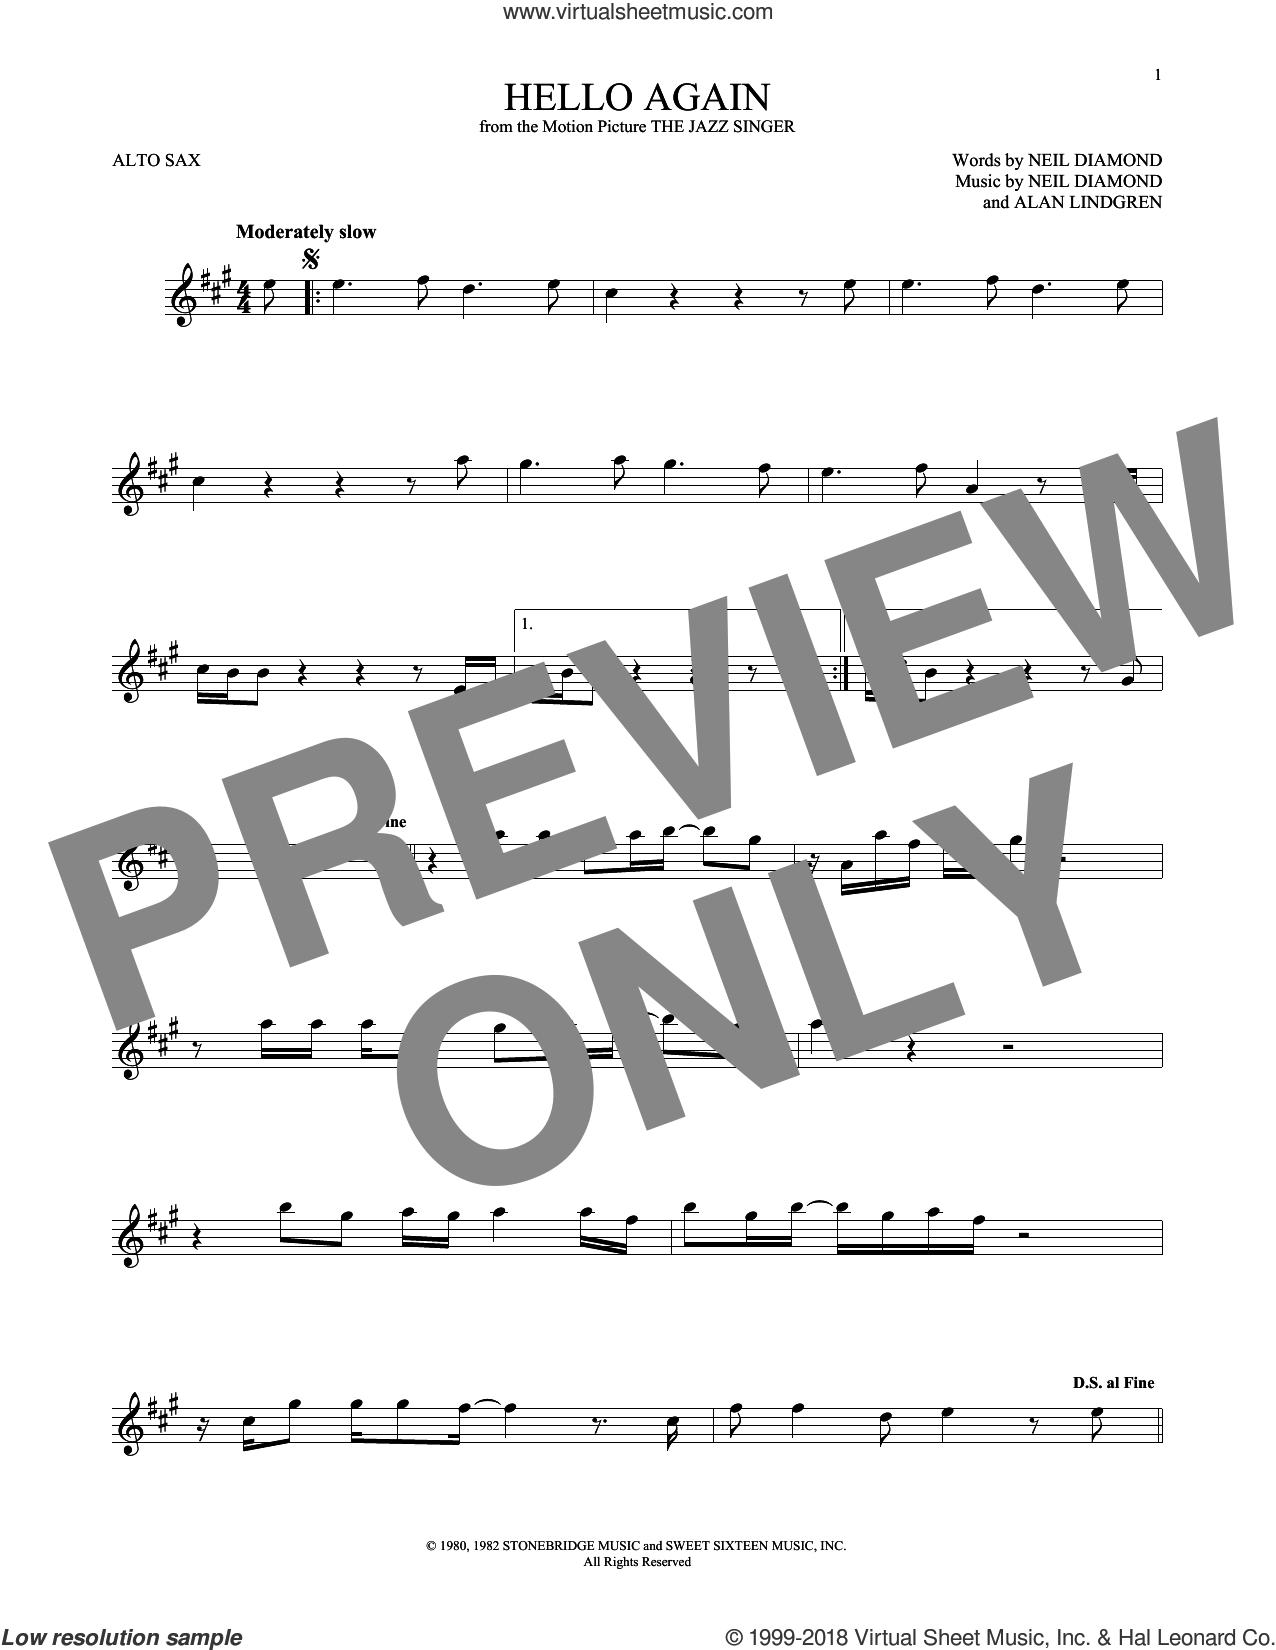 Hello Again sheet music for alto saxophone solo by Neil Diamond and Alan Lindgren, intermediate skill level